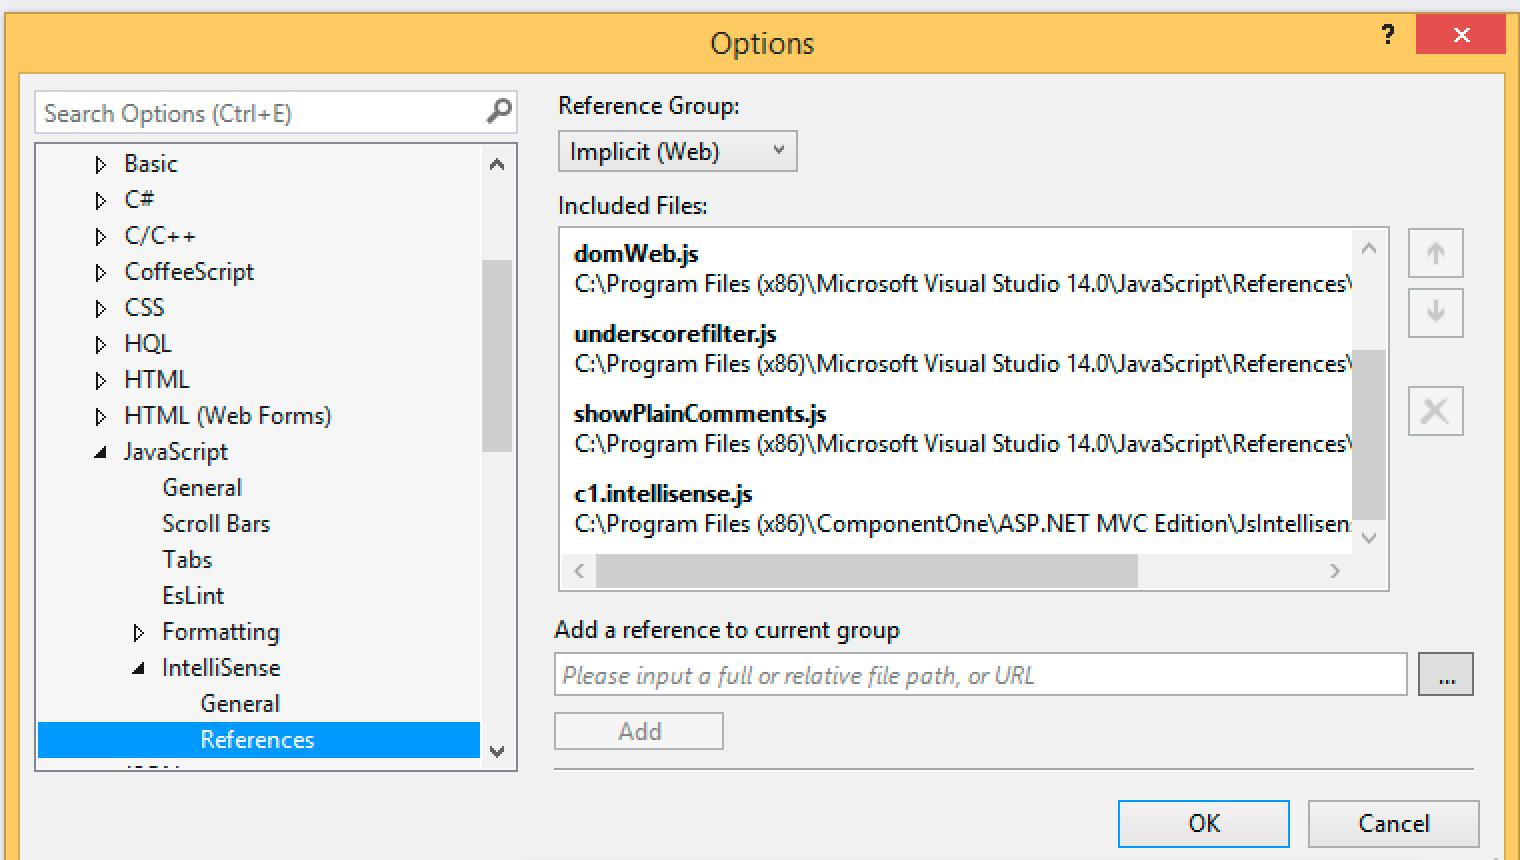 JavaScript IntelliSense improvement in ASP NET MVC Edition